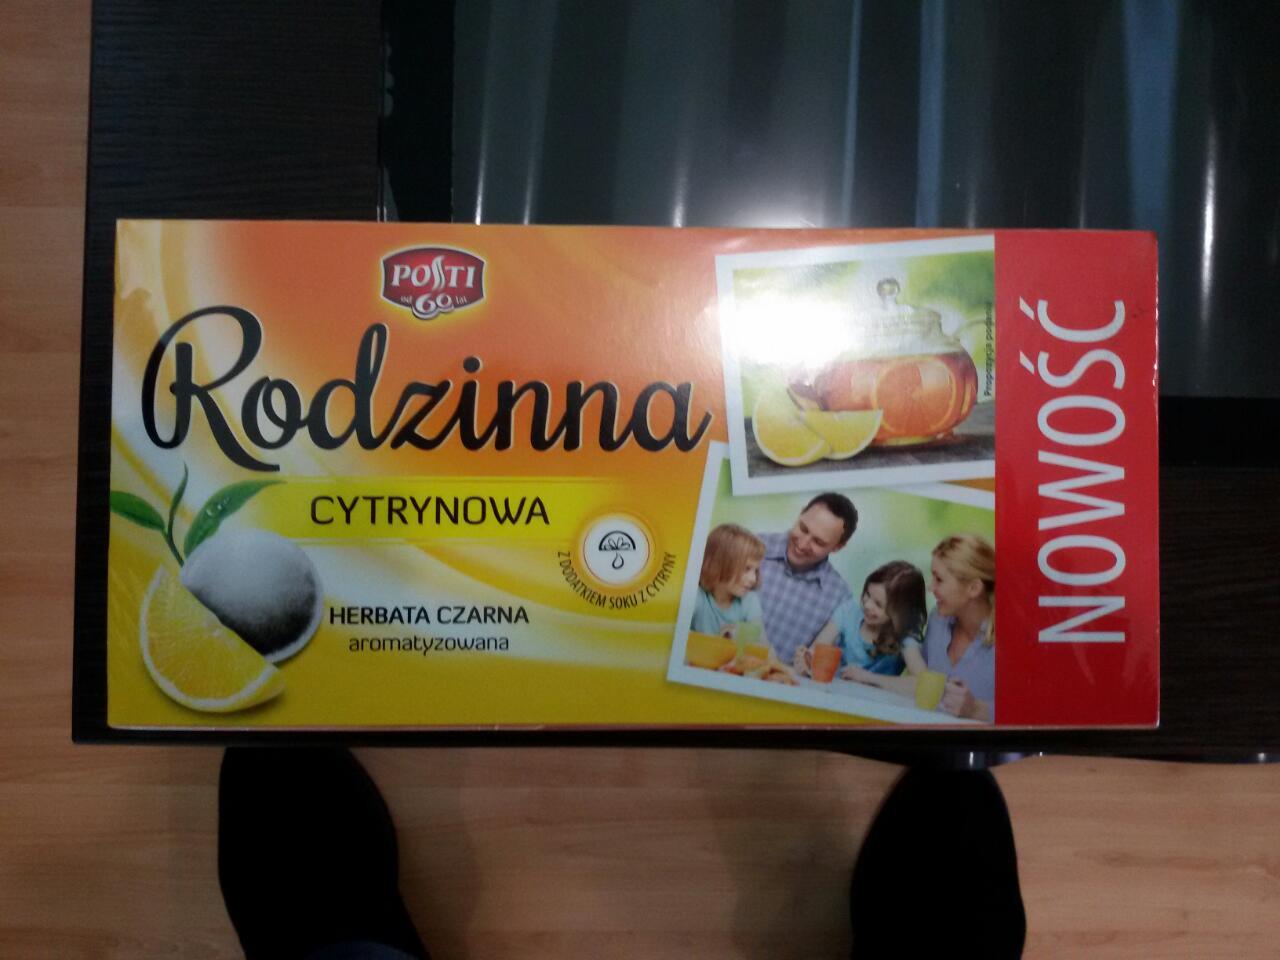 Чай Rodzinna (Родзина) Cytrynowa 100 пакетов. Польша.